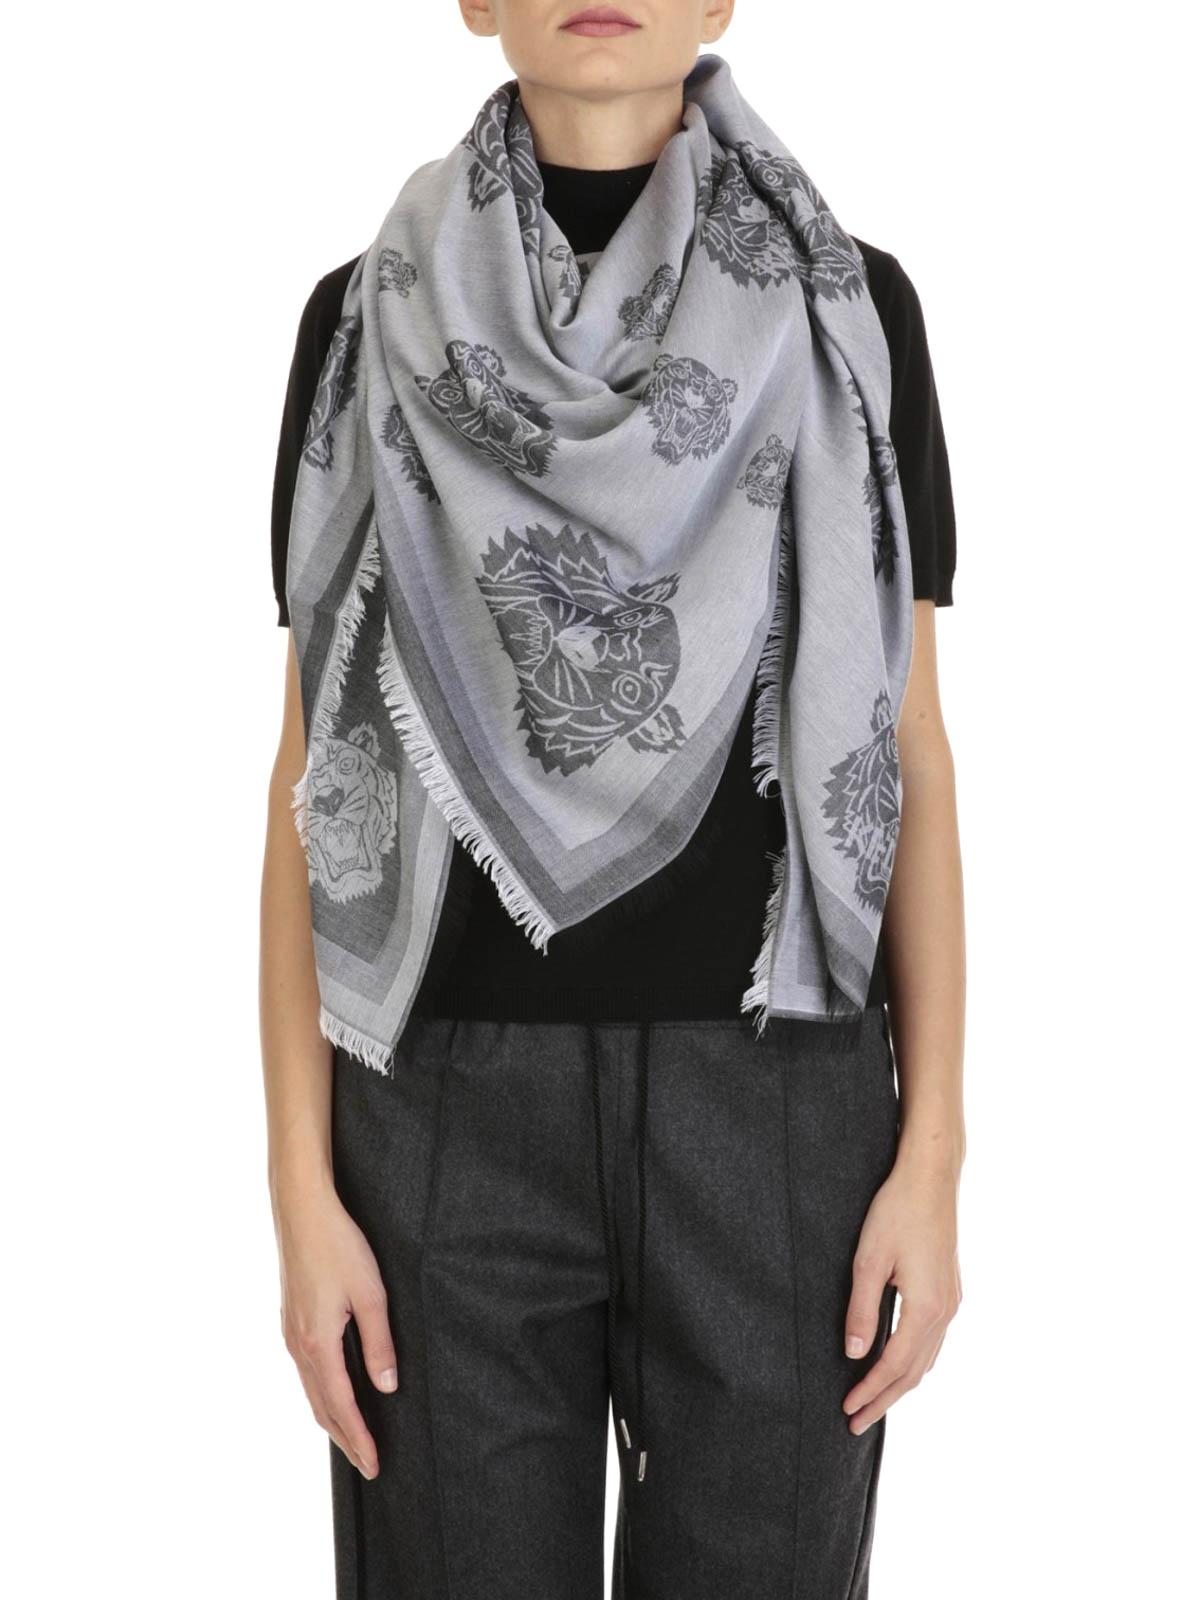 0450be0fa1cf Kenzo - Foulard Tiger in misto cotone - sciarpe e foulard - 01404 ...